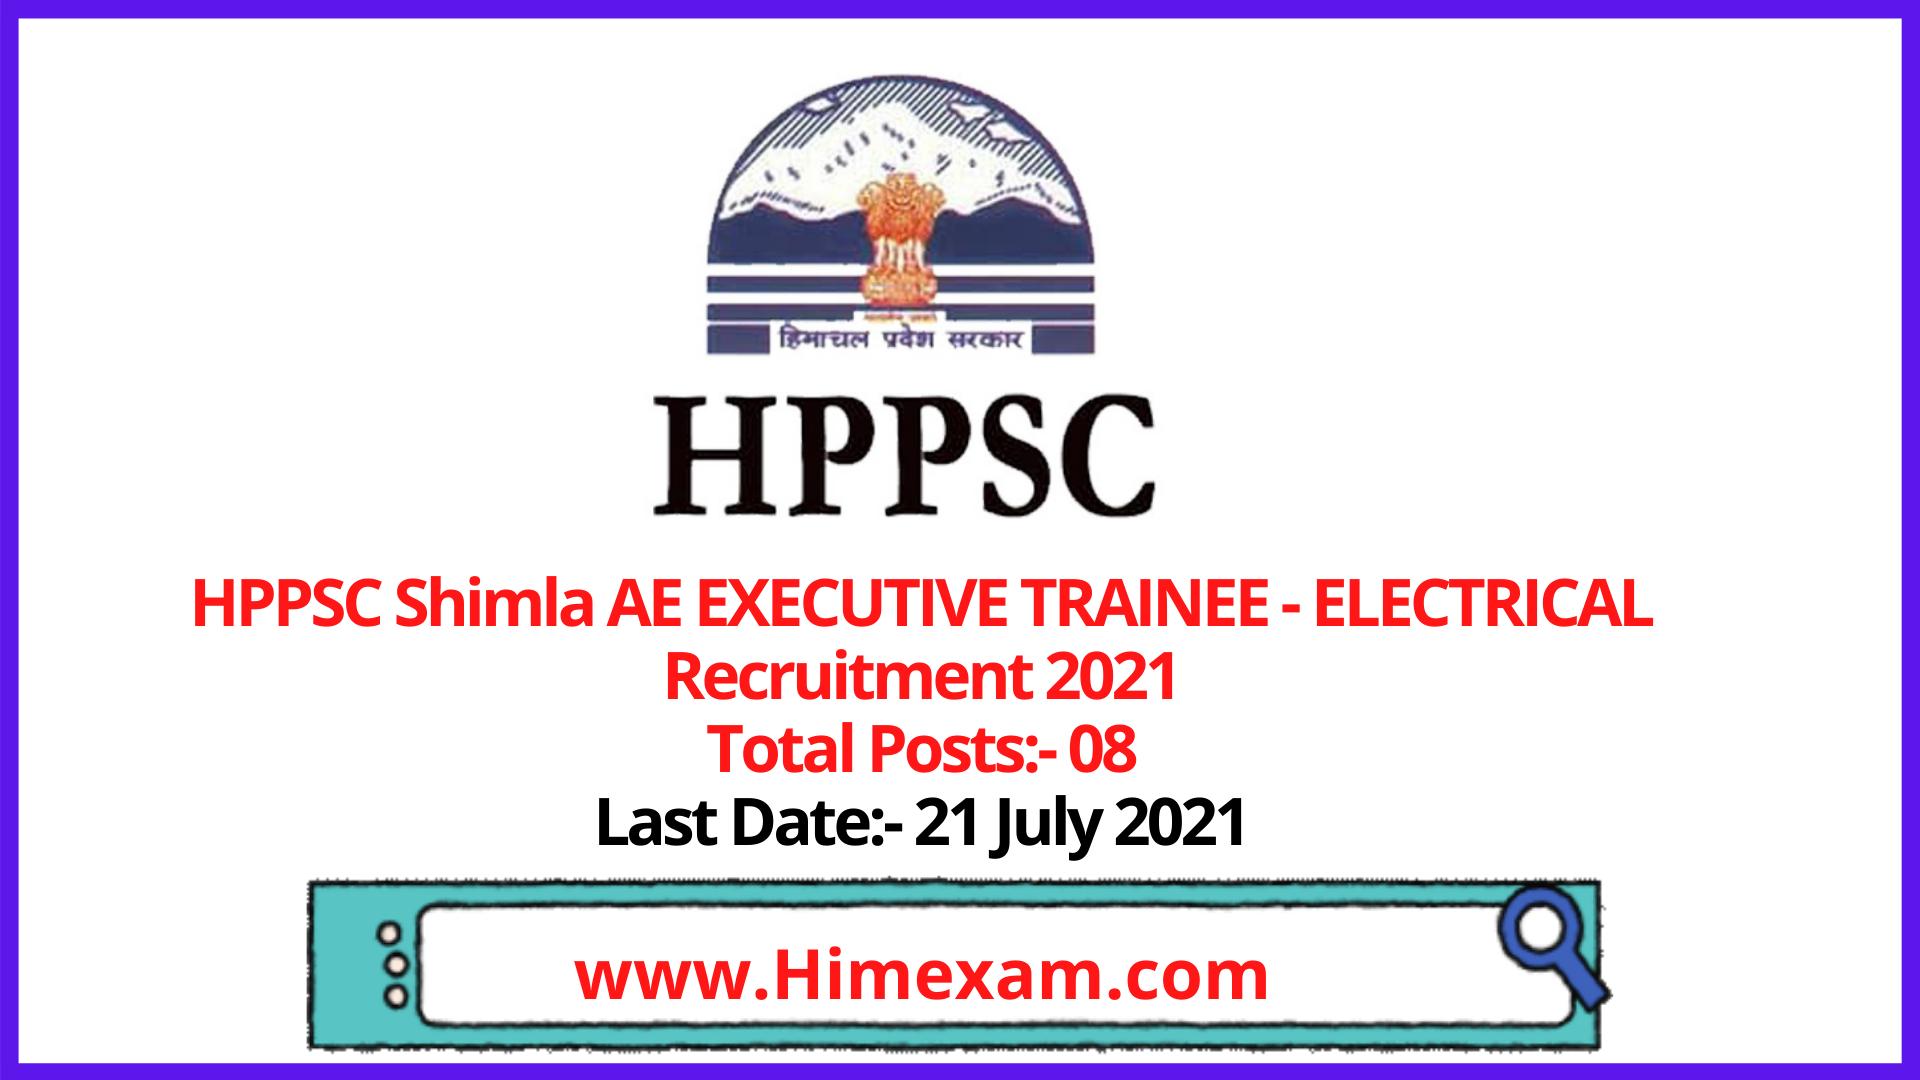 HPPSC Shimla  AE EXECUTIVE TRAINEE - ELECTRICAL Recruitment 2021